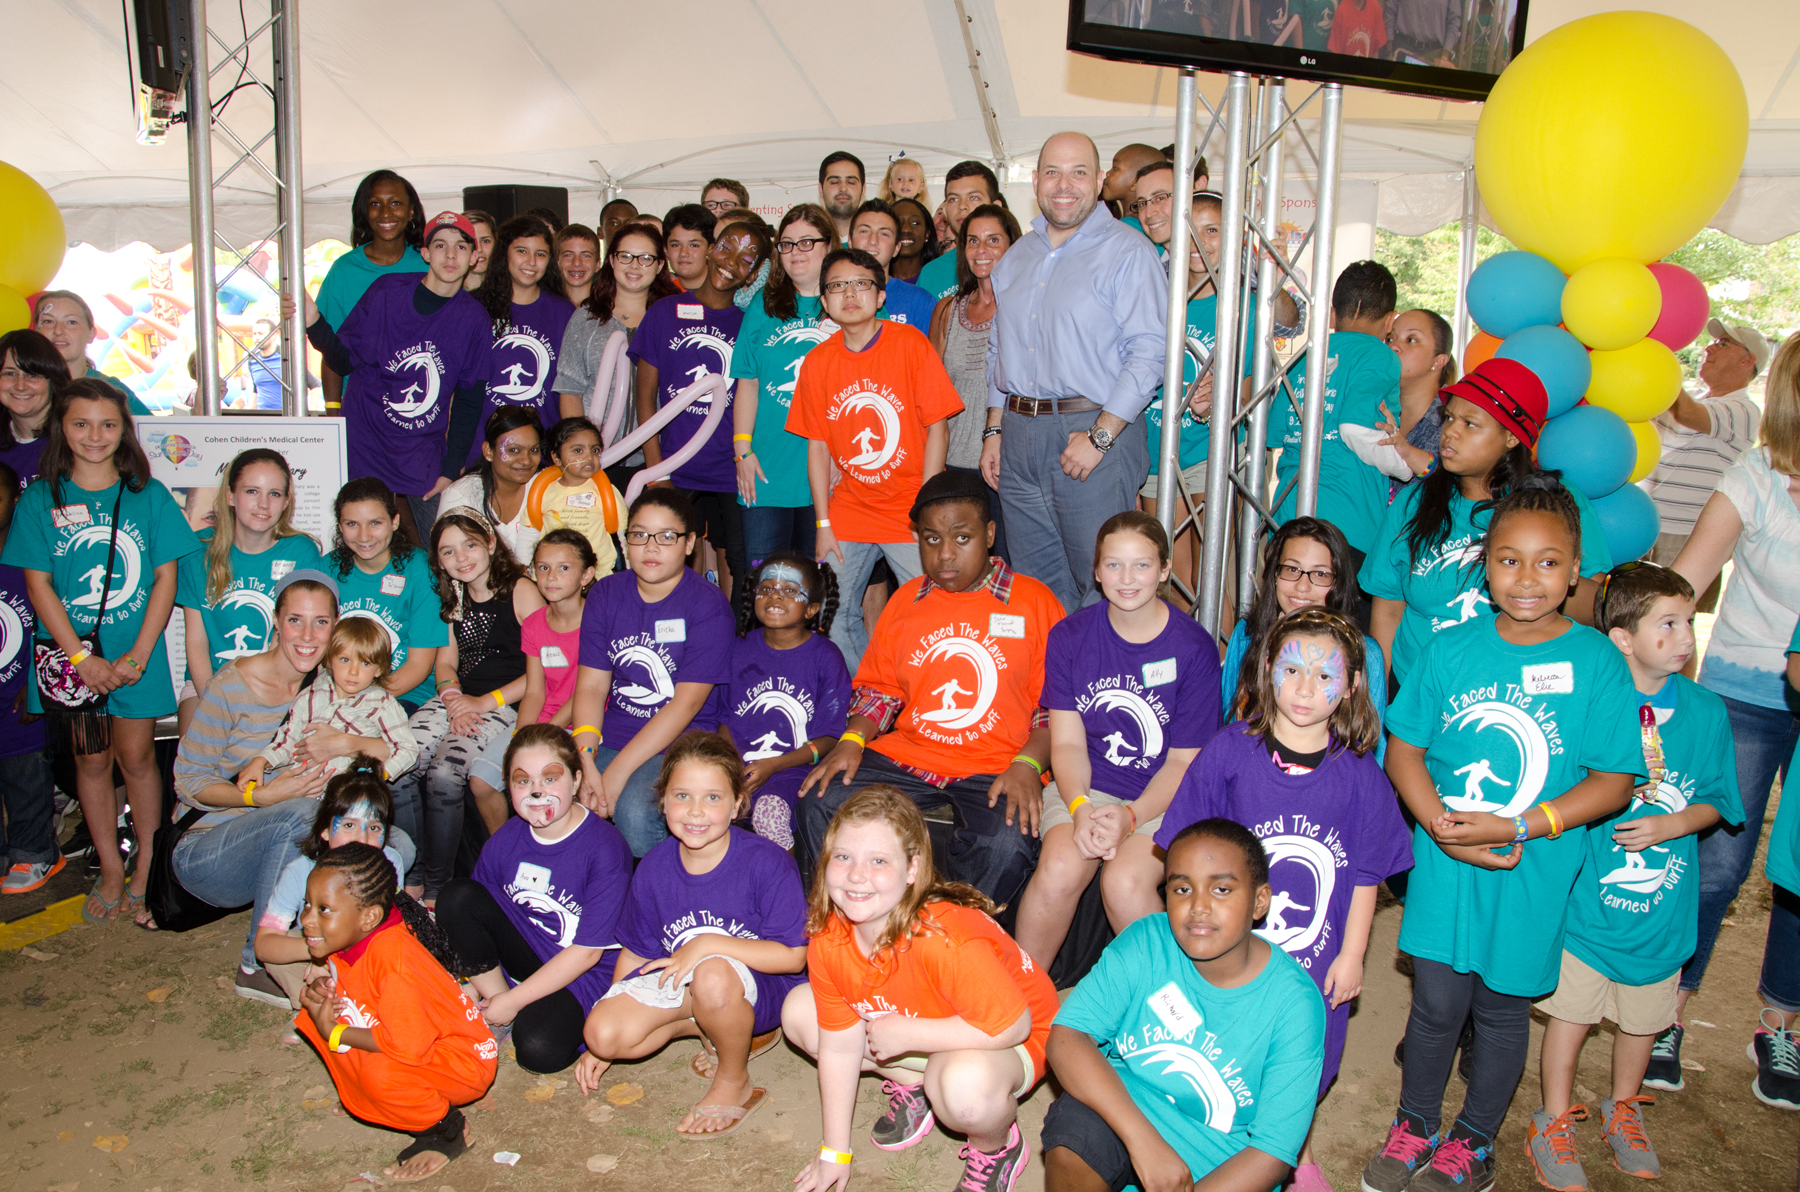 3rd Annual Pediatric Cancer Survivors Day